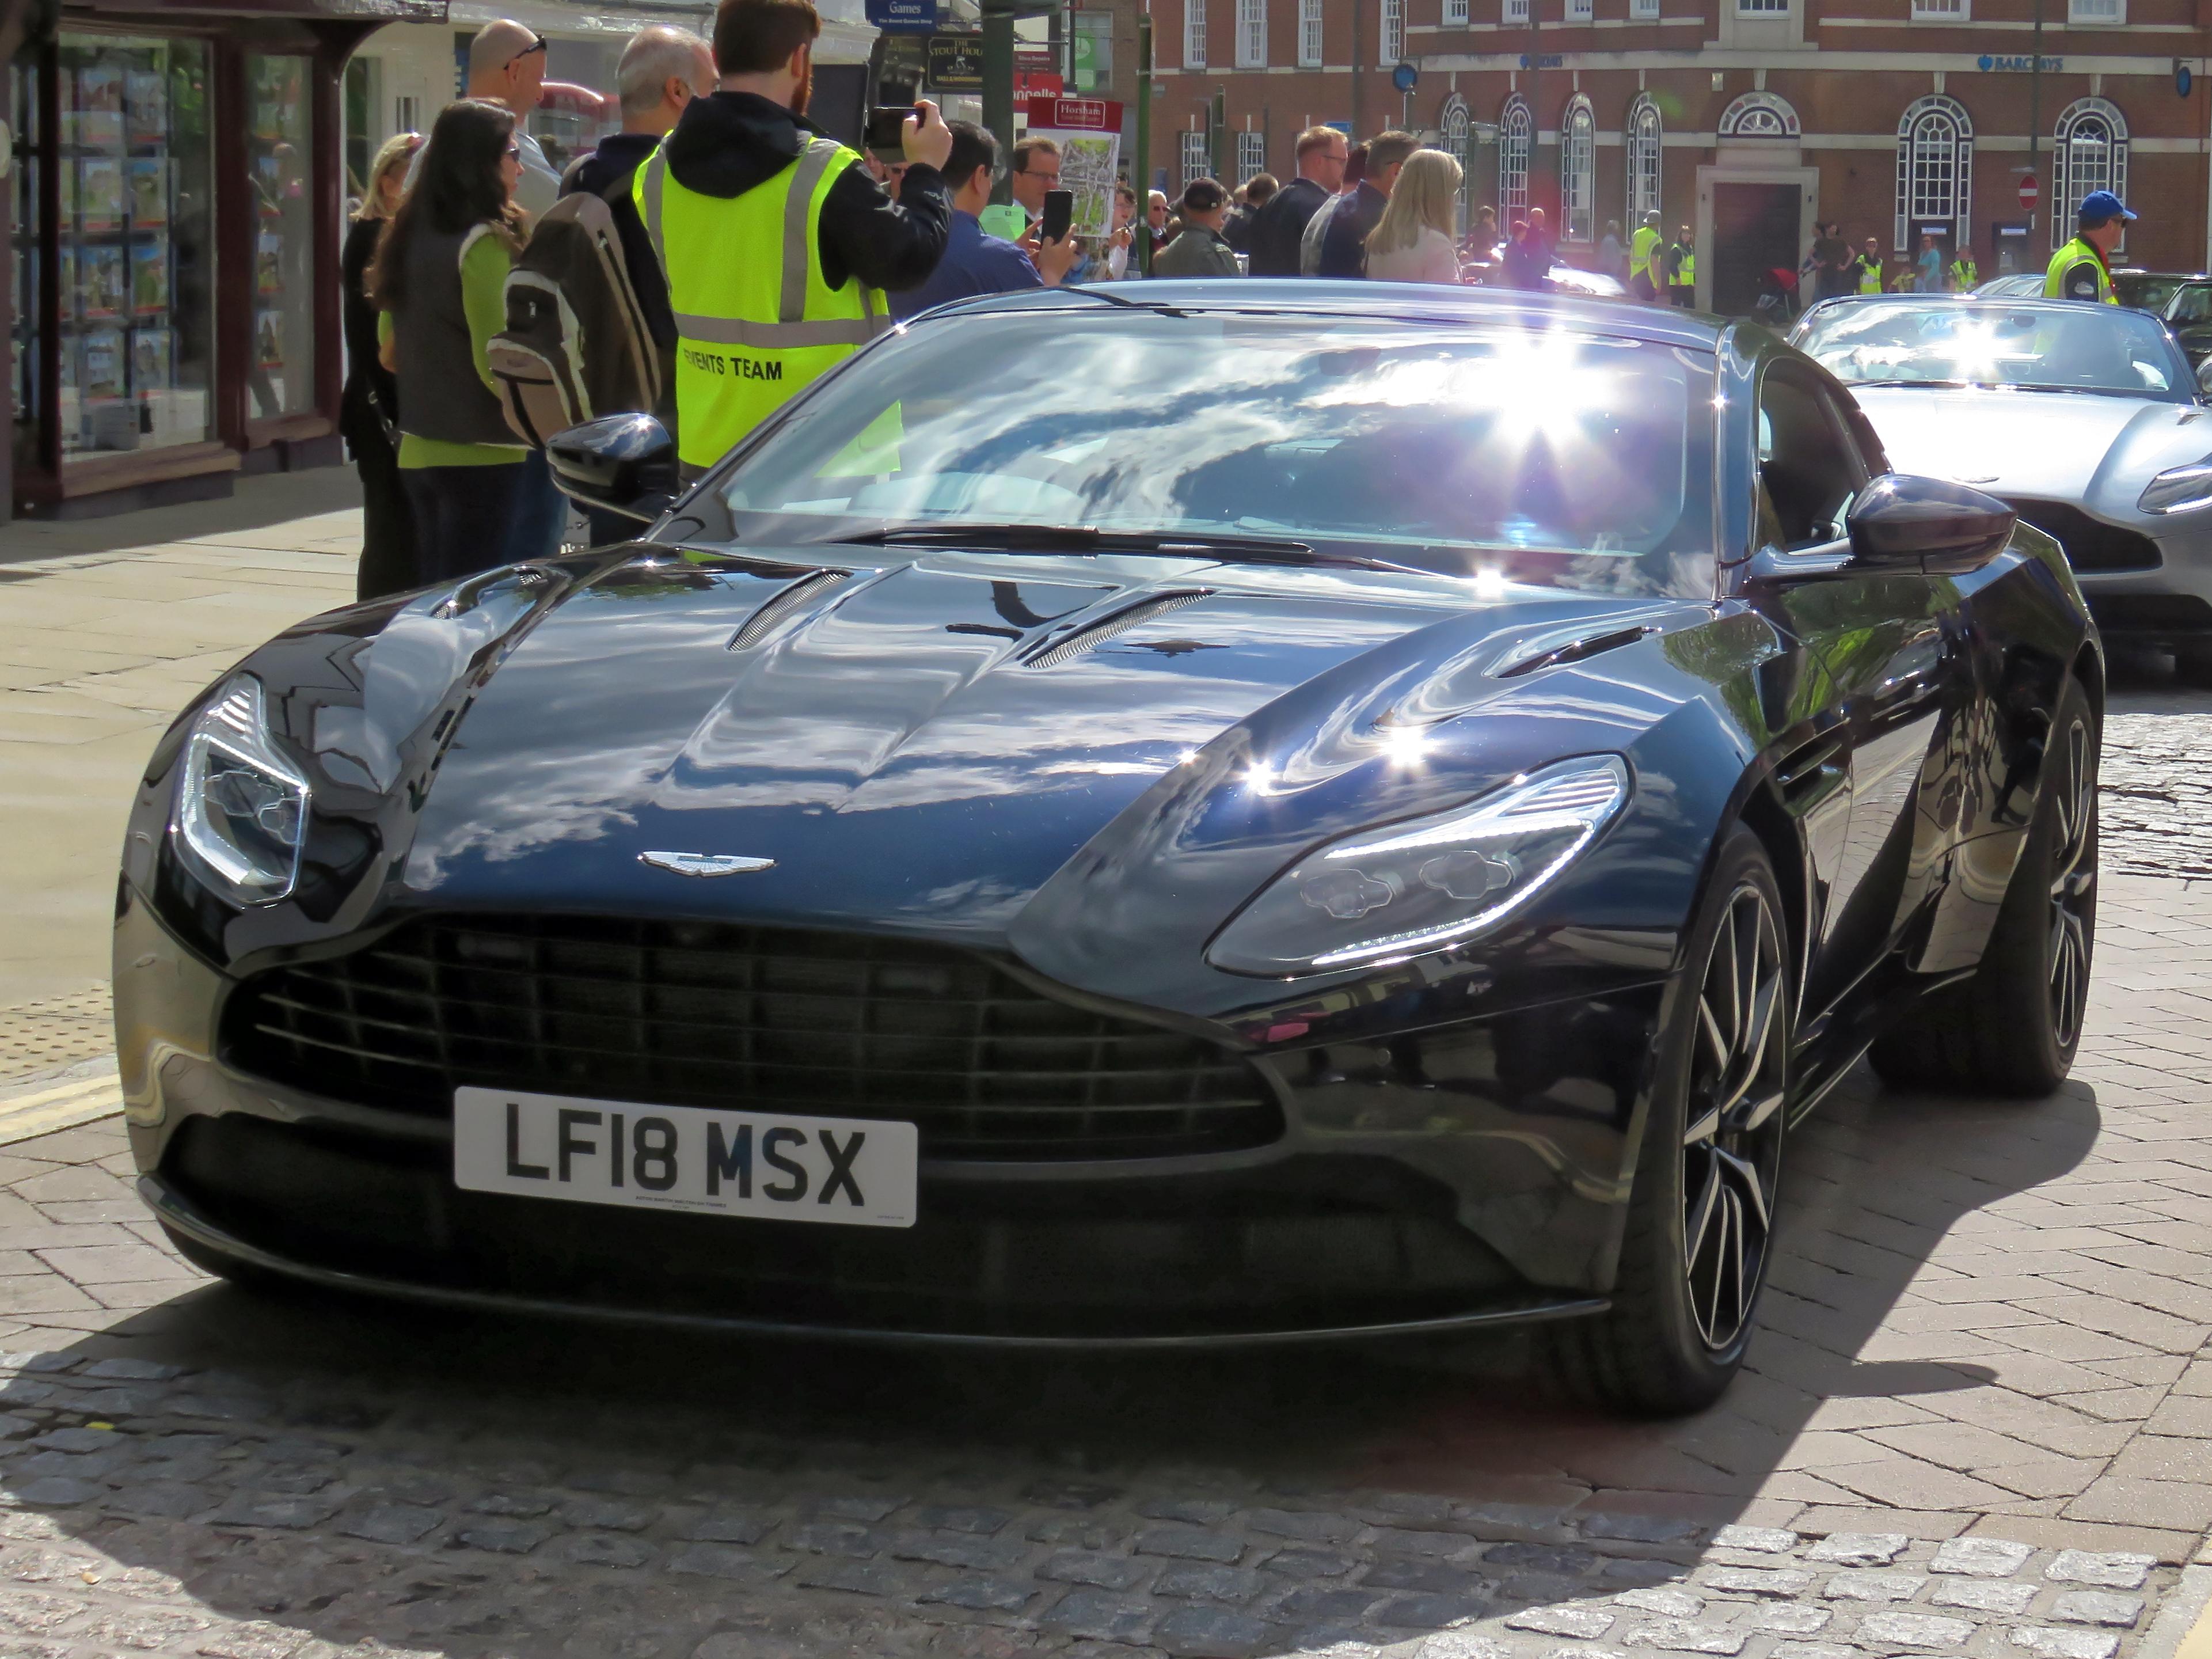 File 2018 Aston Martin Db11 V12 5204 Cc At Horsham English Festival